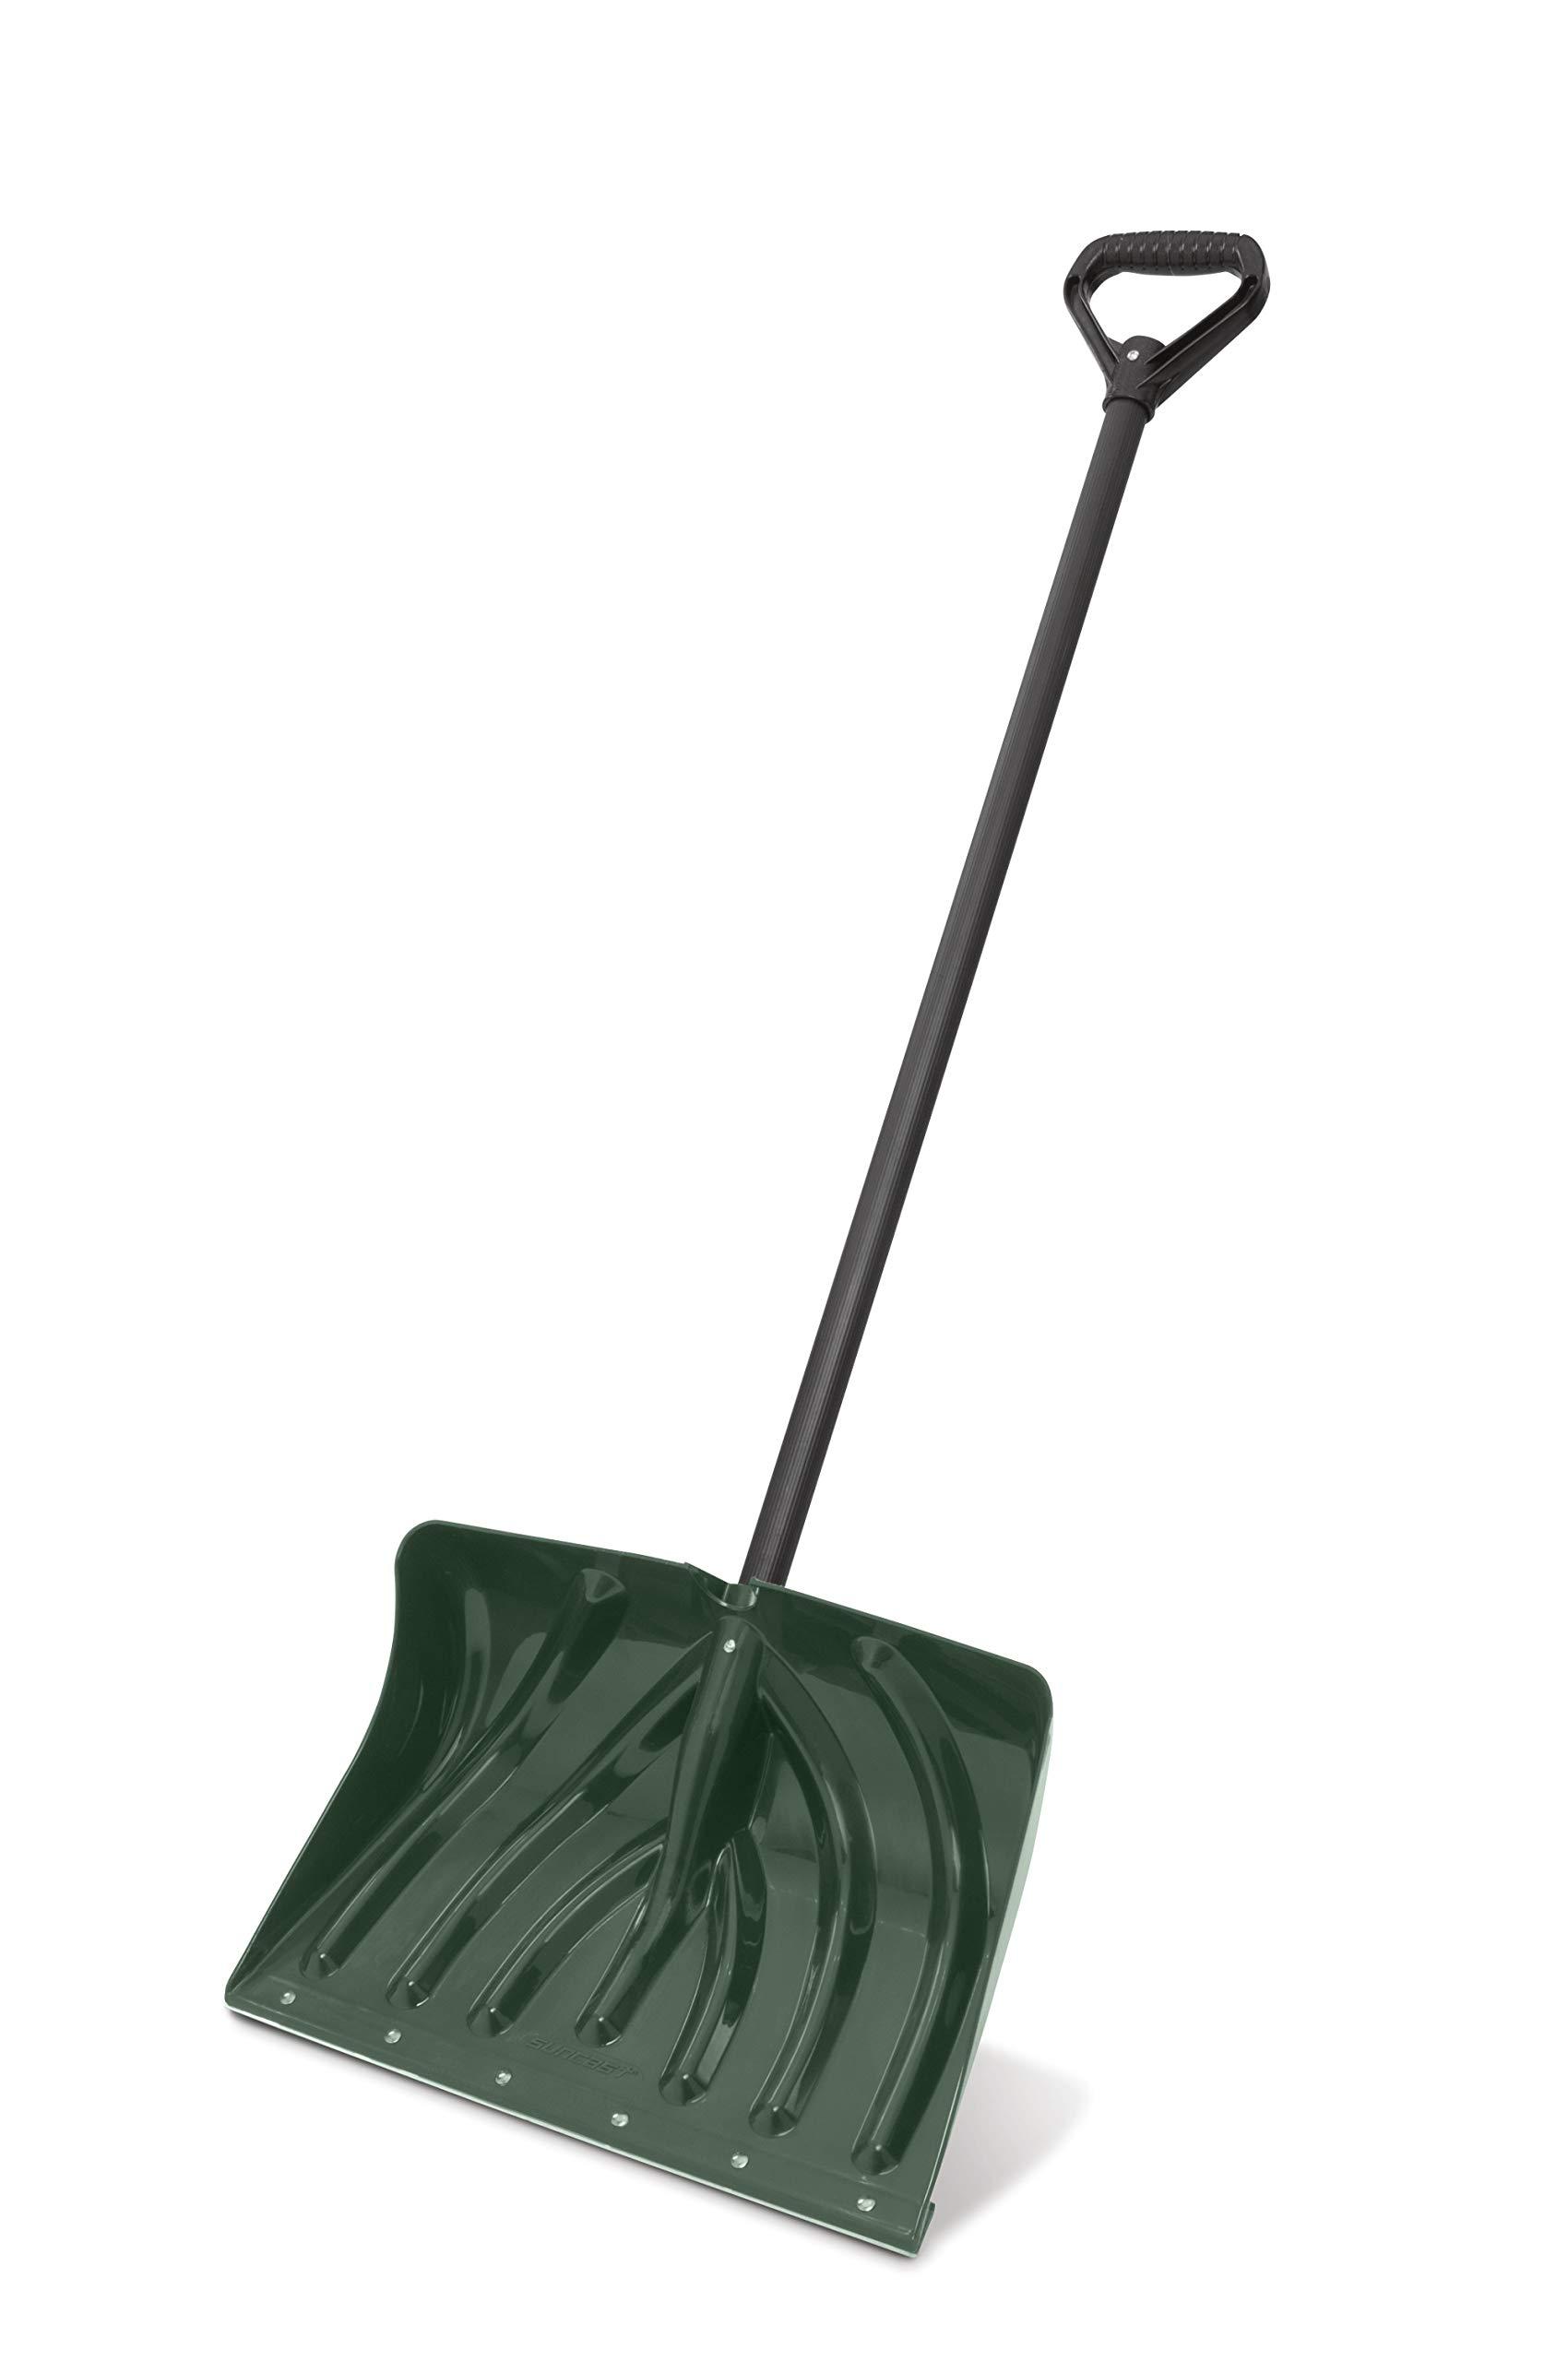 Suncast SC1350 18-Inch Snow Shovel/Pusher Combo with Wear Strip, Green by Suncast